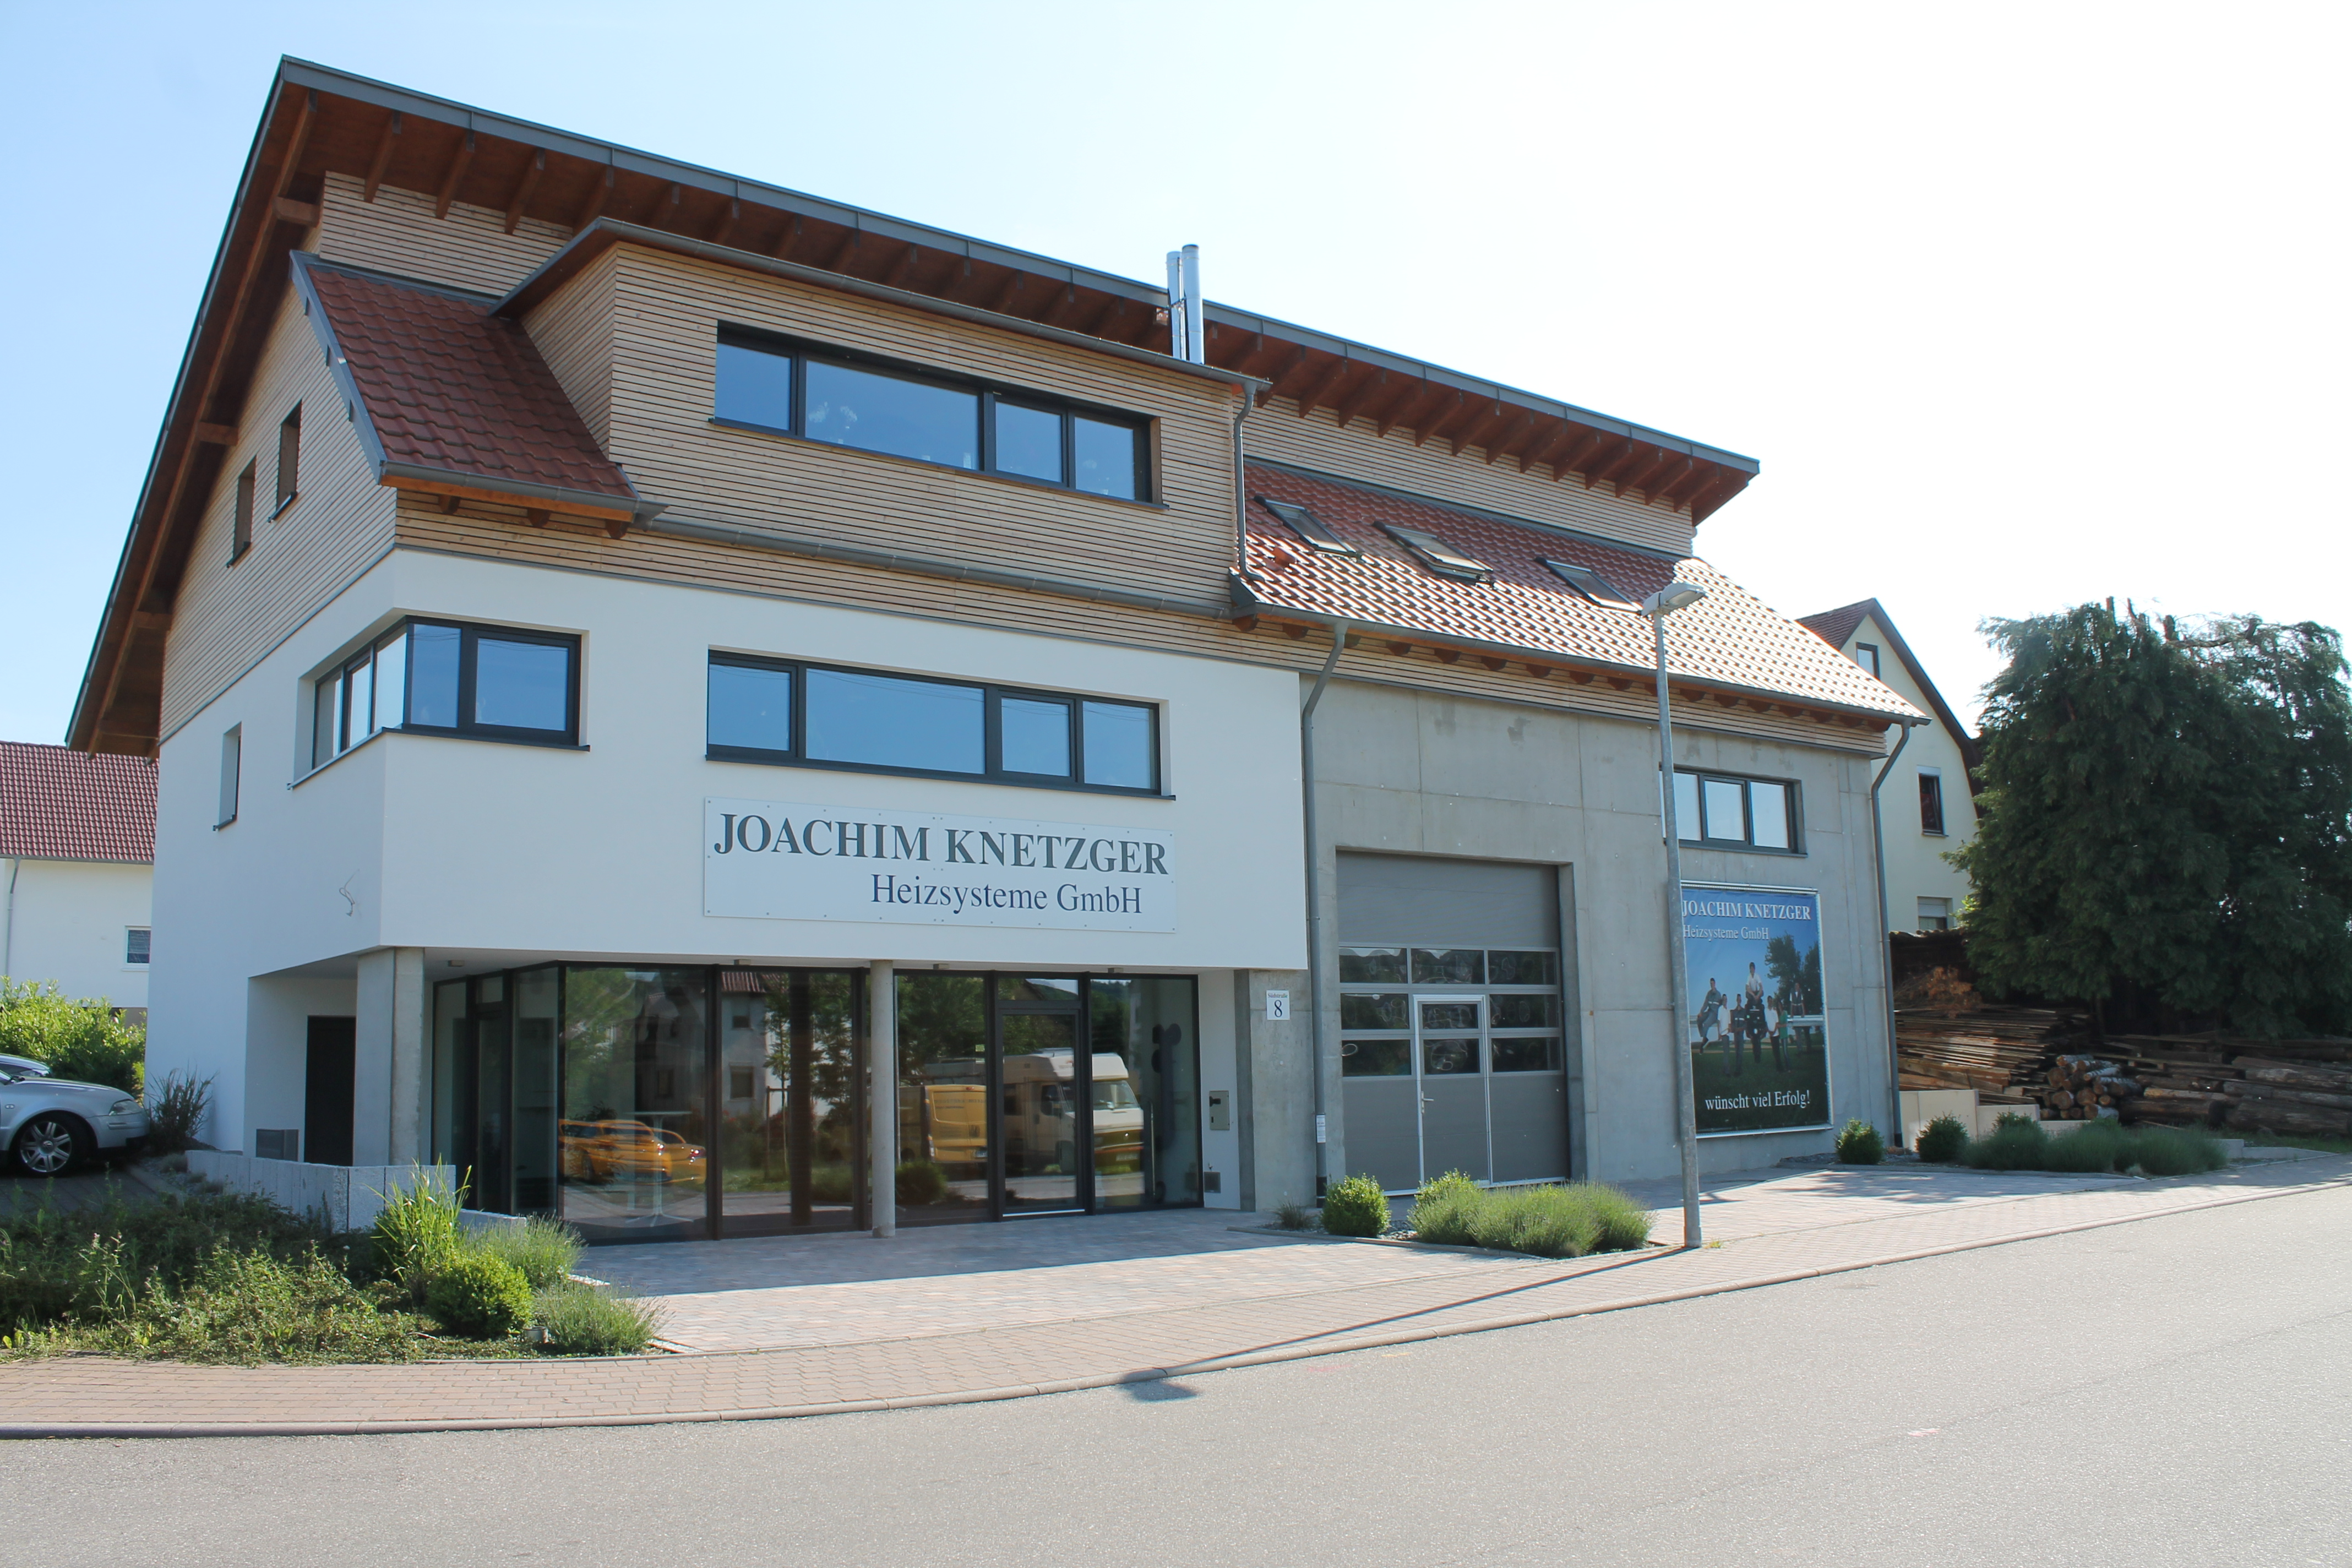 Firmensitz Joachim Knetzger Dandwerker ds Monats Mai 2018 Pfaffenhofen